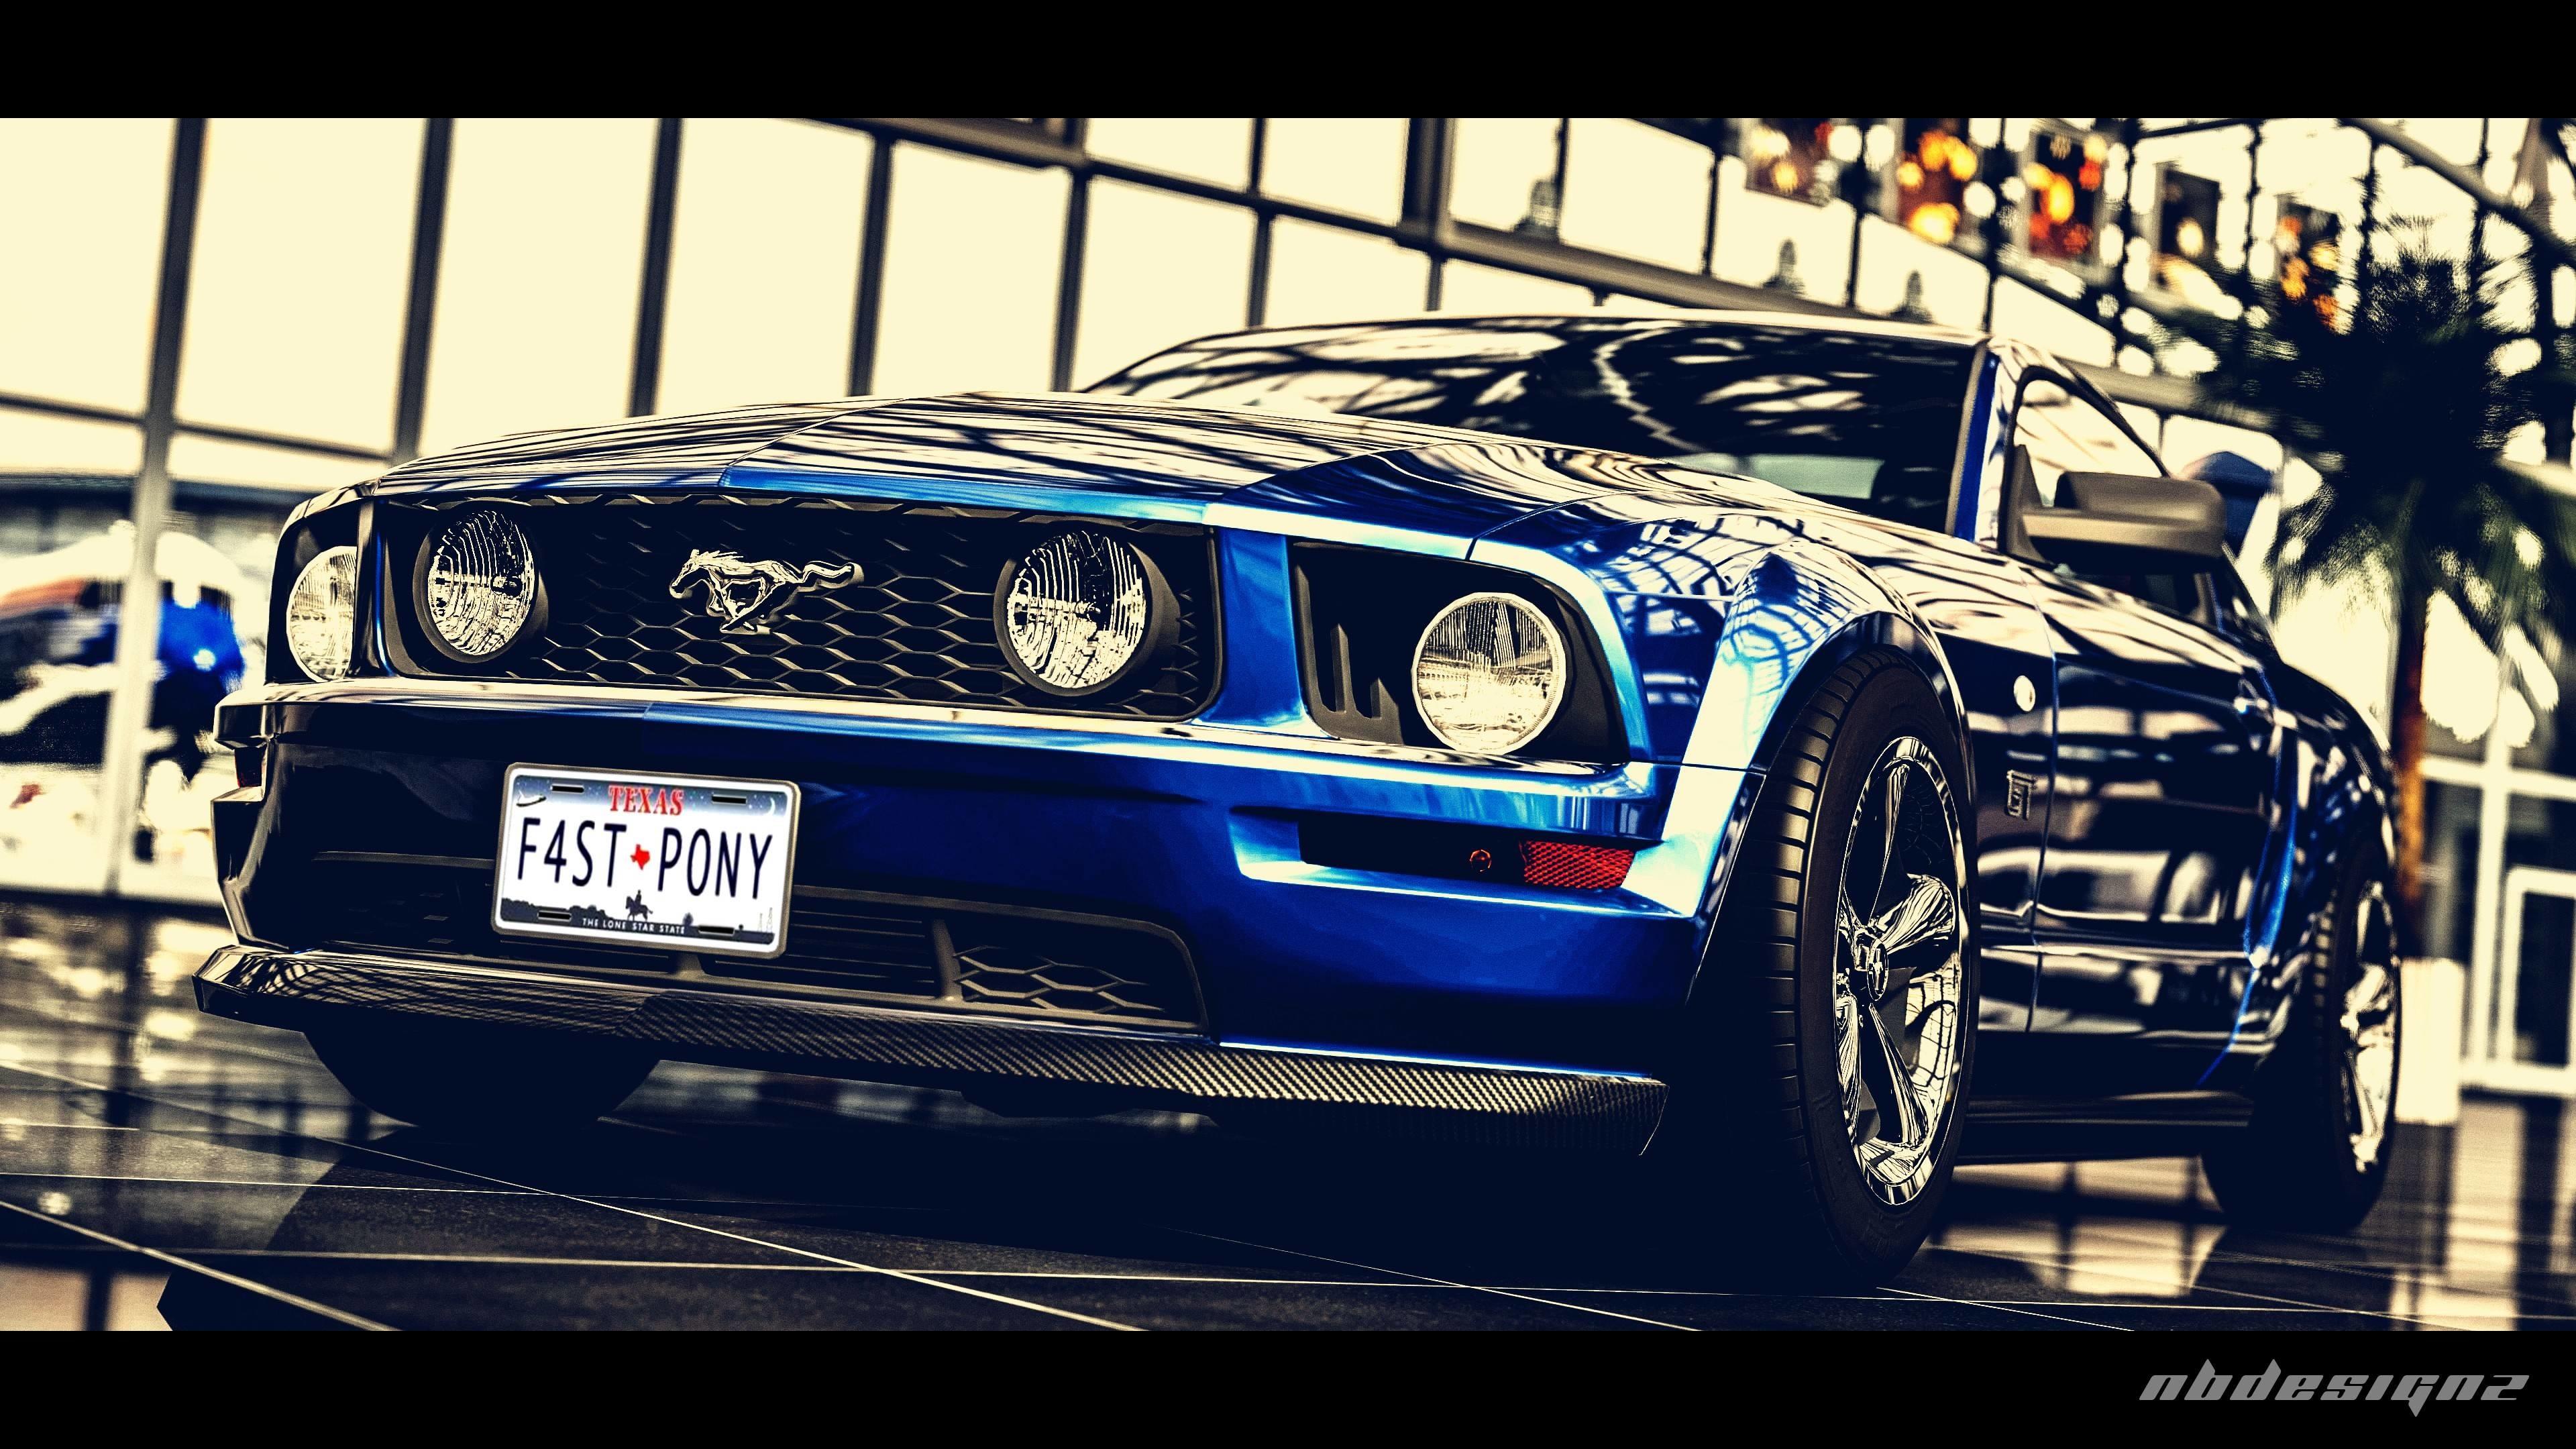 Ford Mustang wallpaper | Ford Mustang wallpaper – Part 9